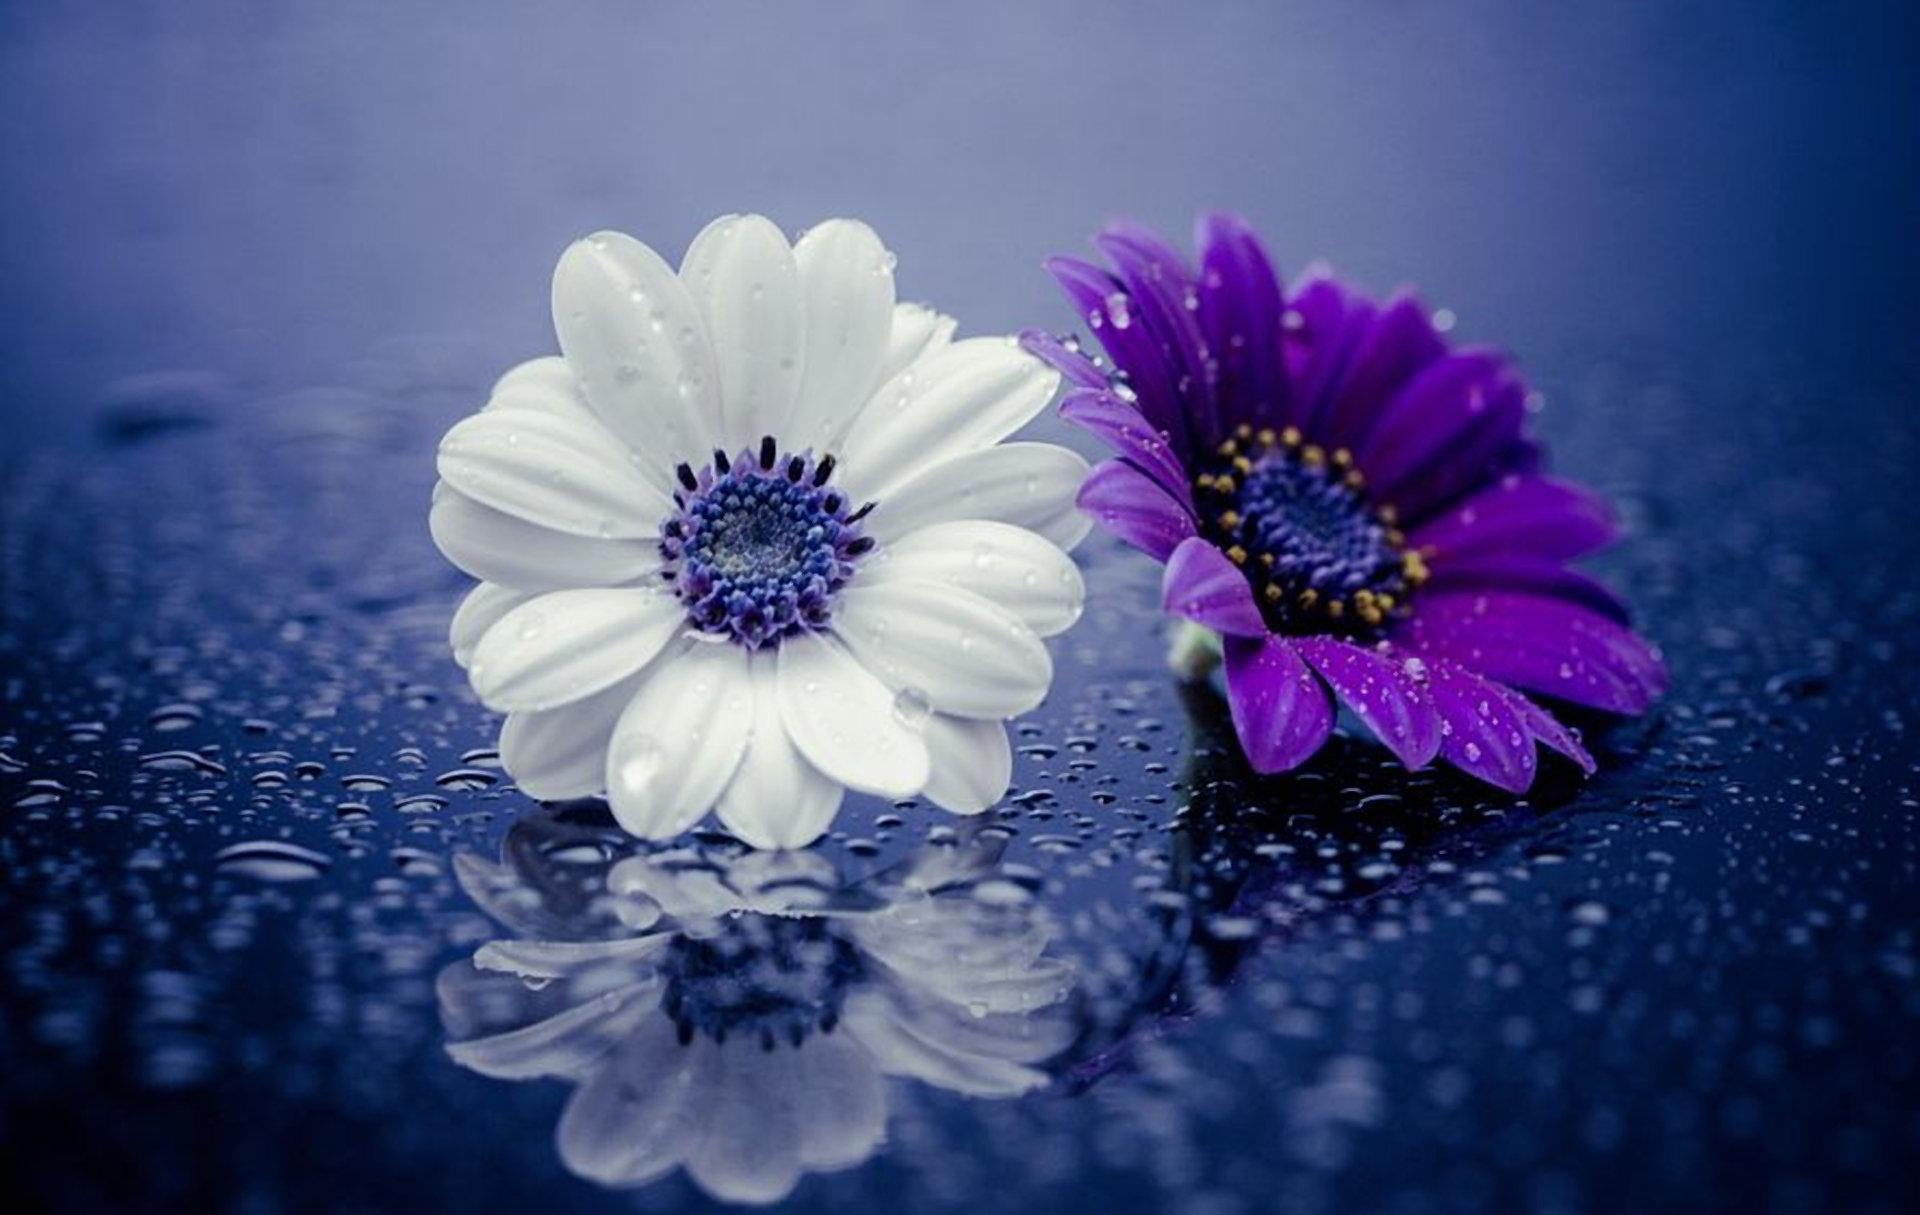 hinh anh hoa cuc dep 50